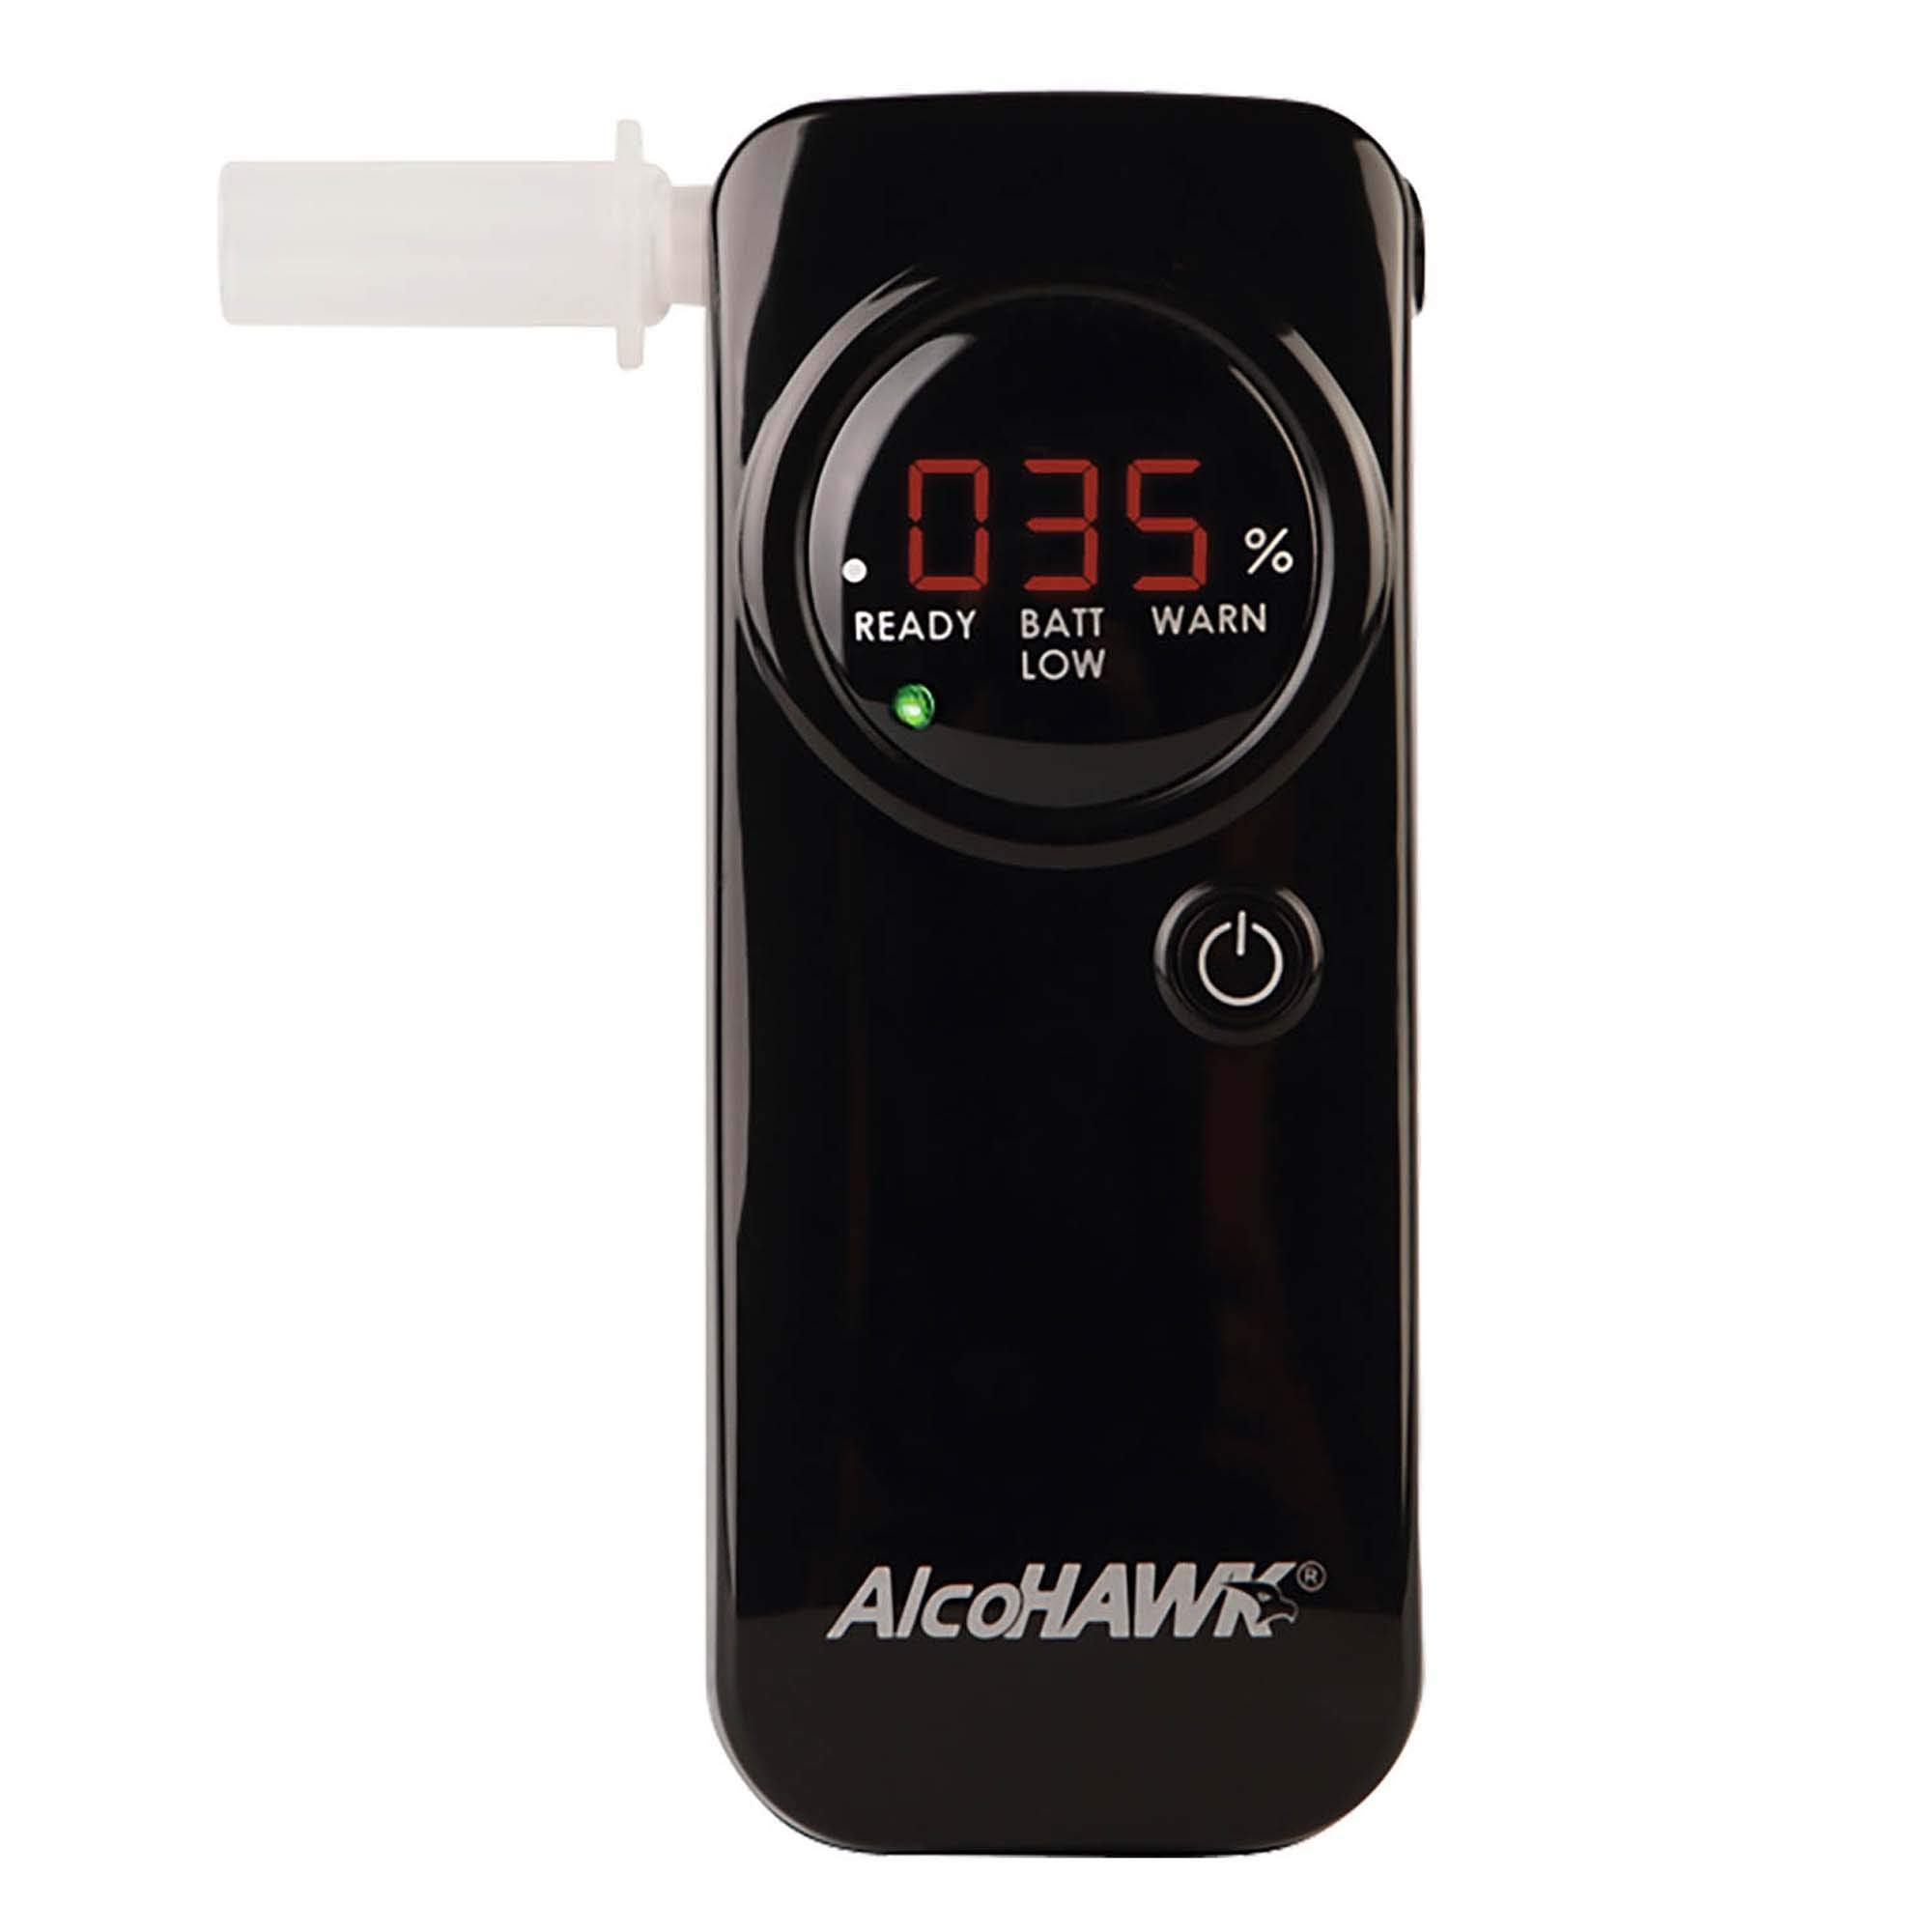 AlcoHAWK Pro FC Fuel-Cell Breathalyzer, Digital Breath Alcohol Tester